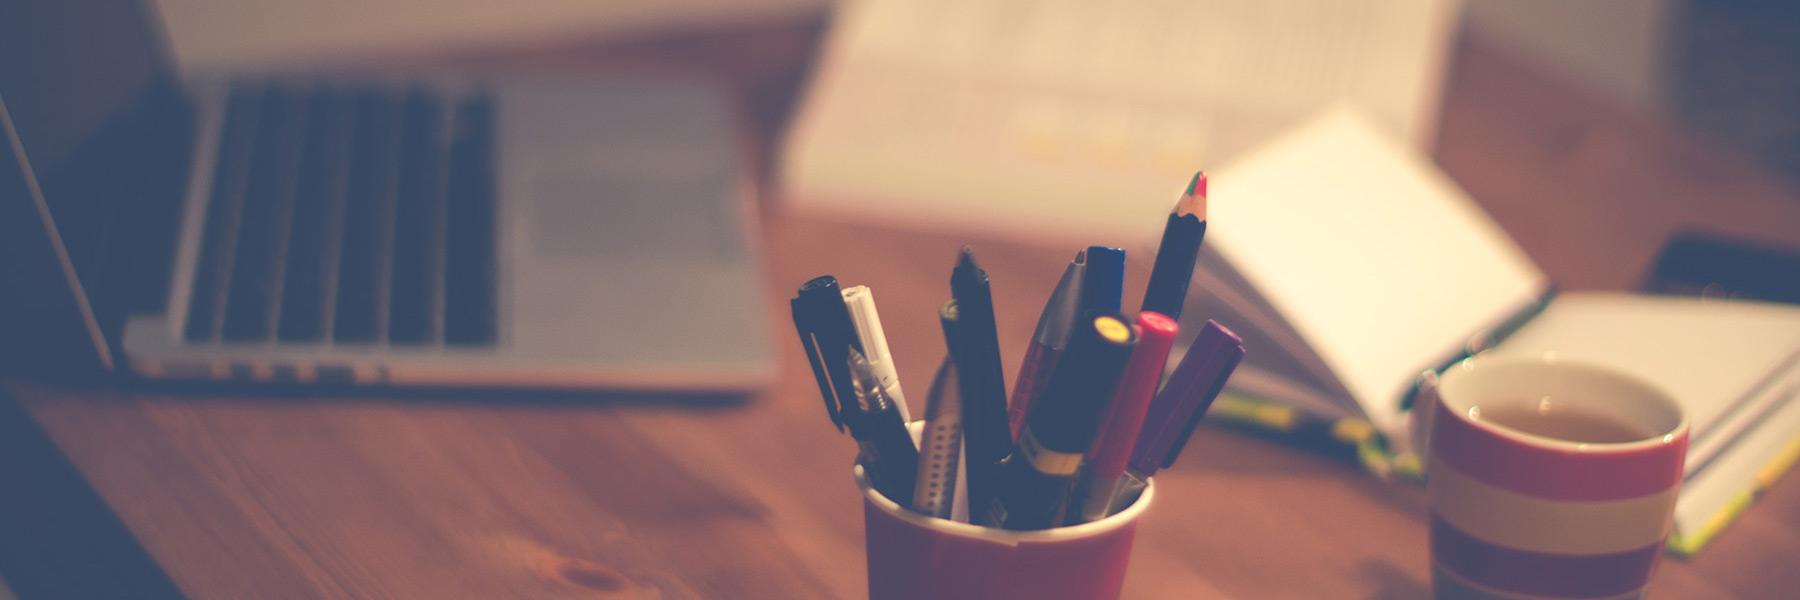 computer-pencils-pano